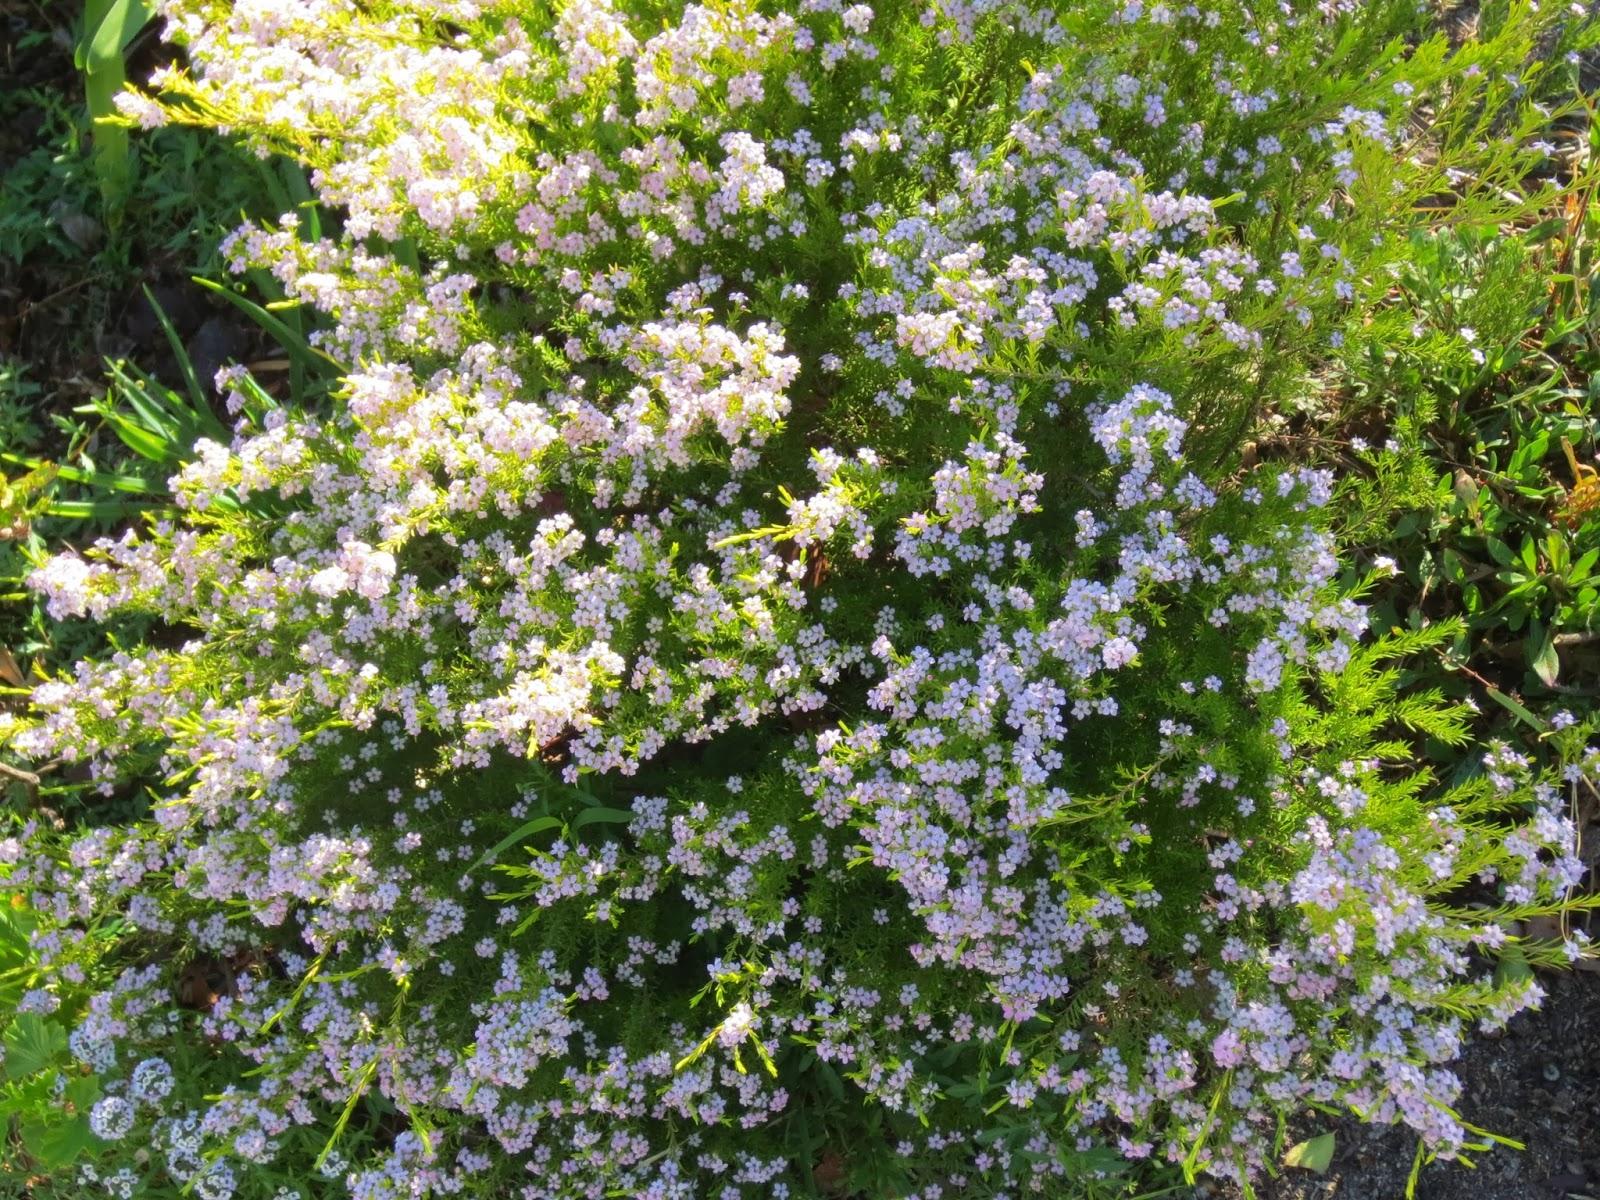 Picture of Live Breath of Heaven aka Coleonema pulchrum Shrubs Plant Fit 5 Gallon Pot